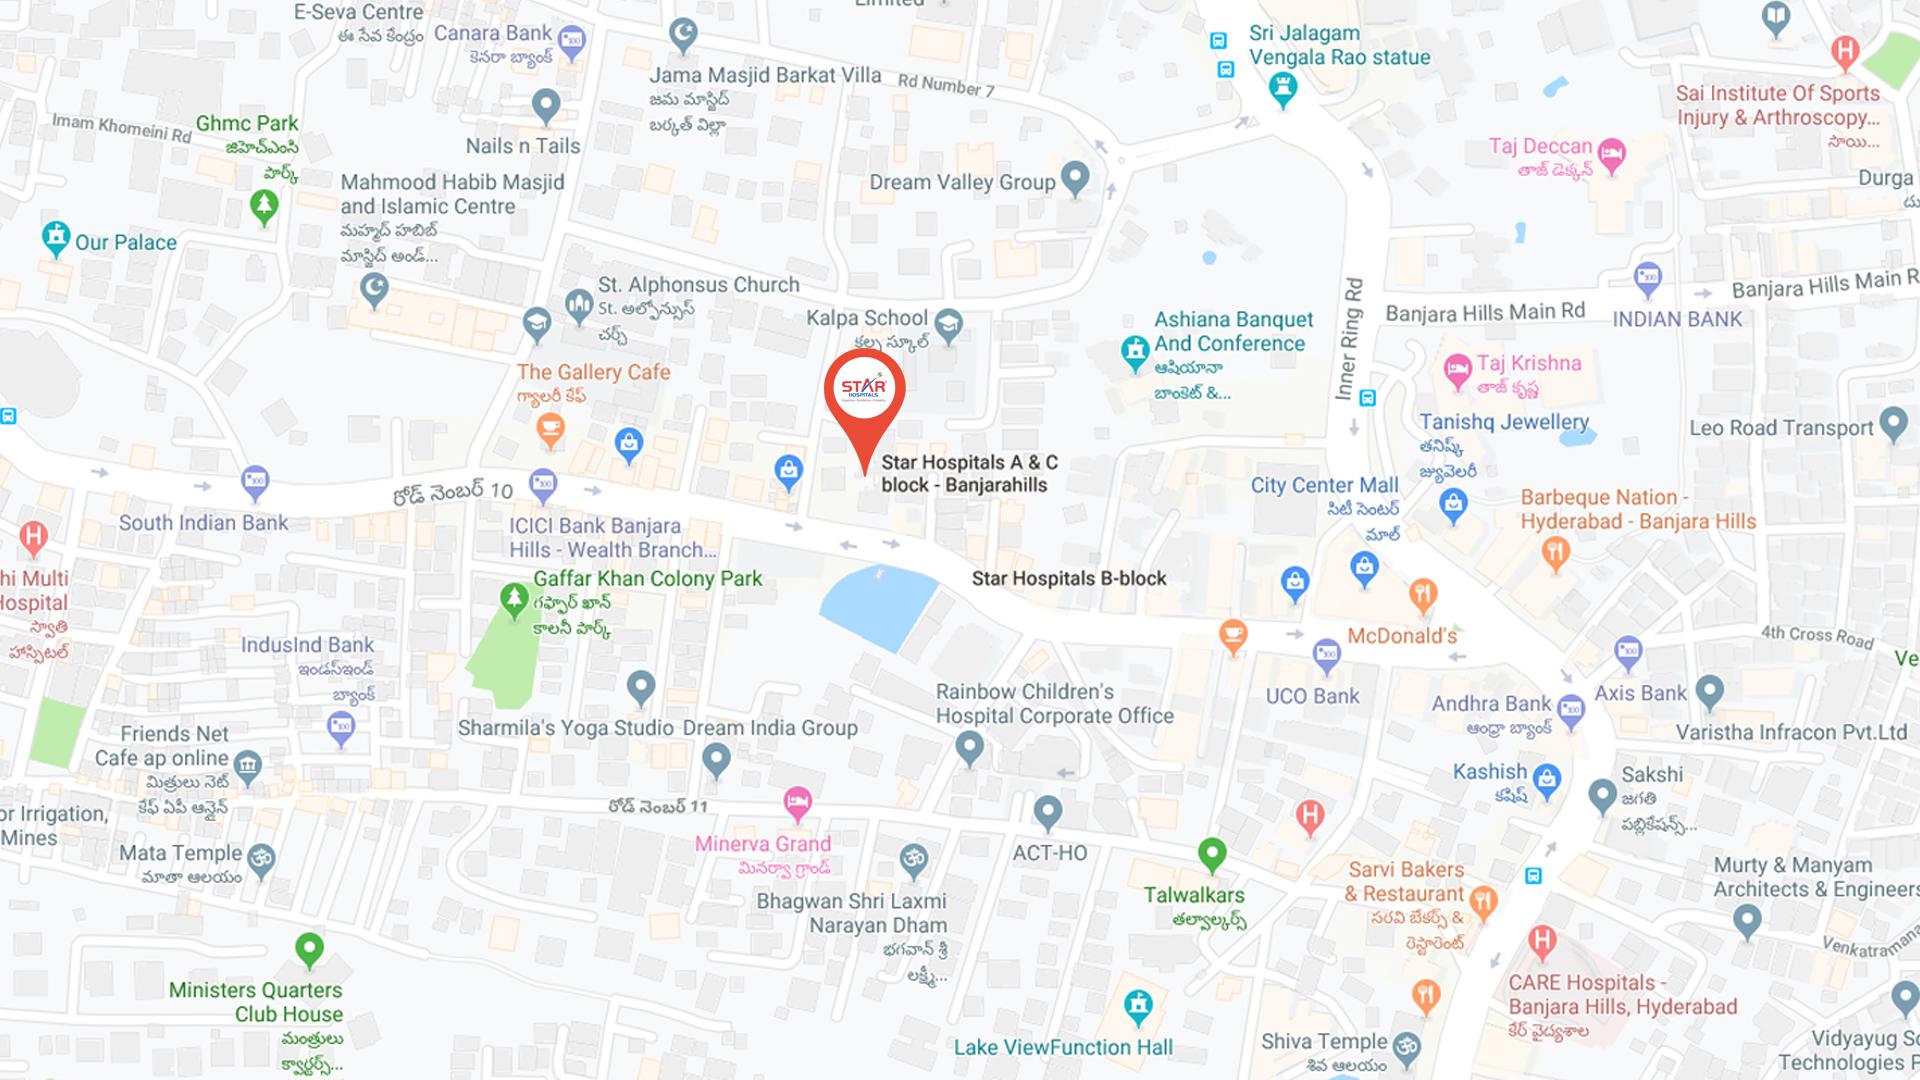 Best Multi Specialty Hospital in Hyderabad   Star Hospitals